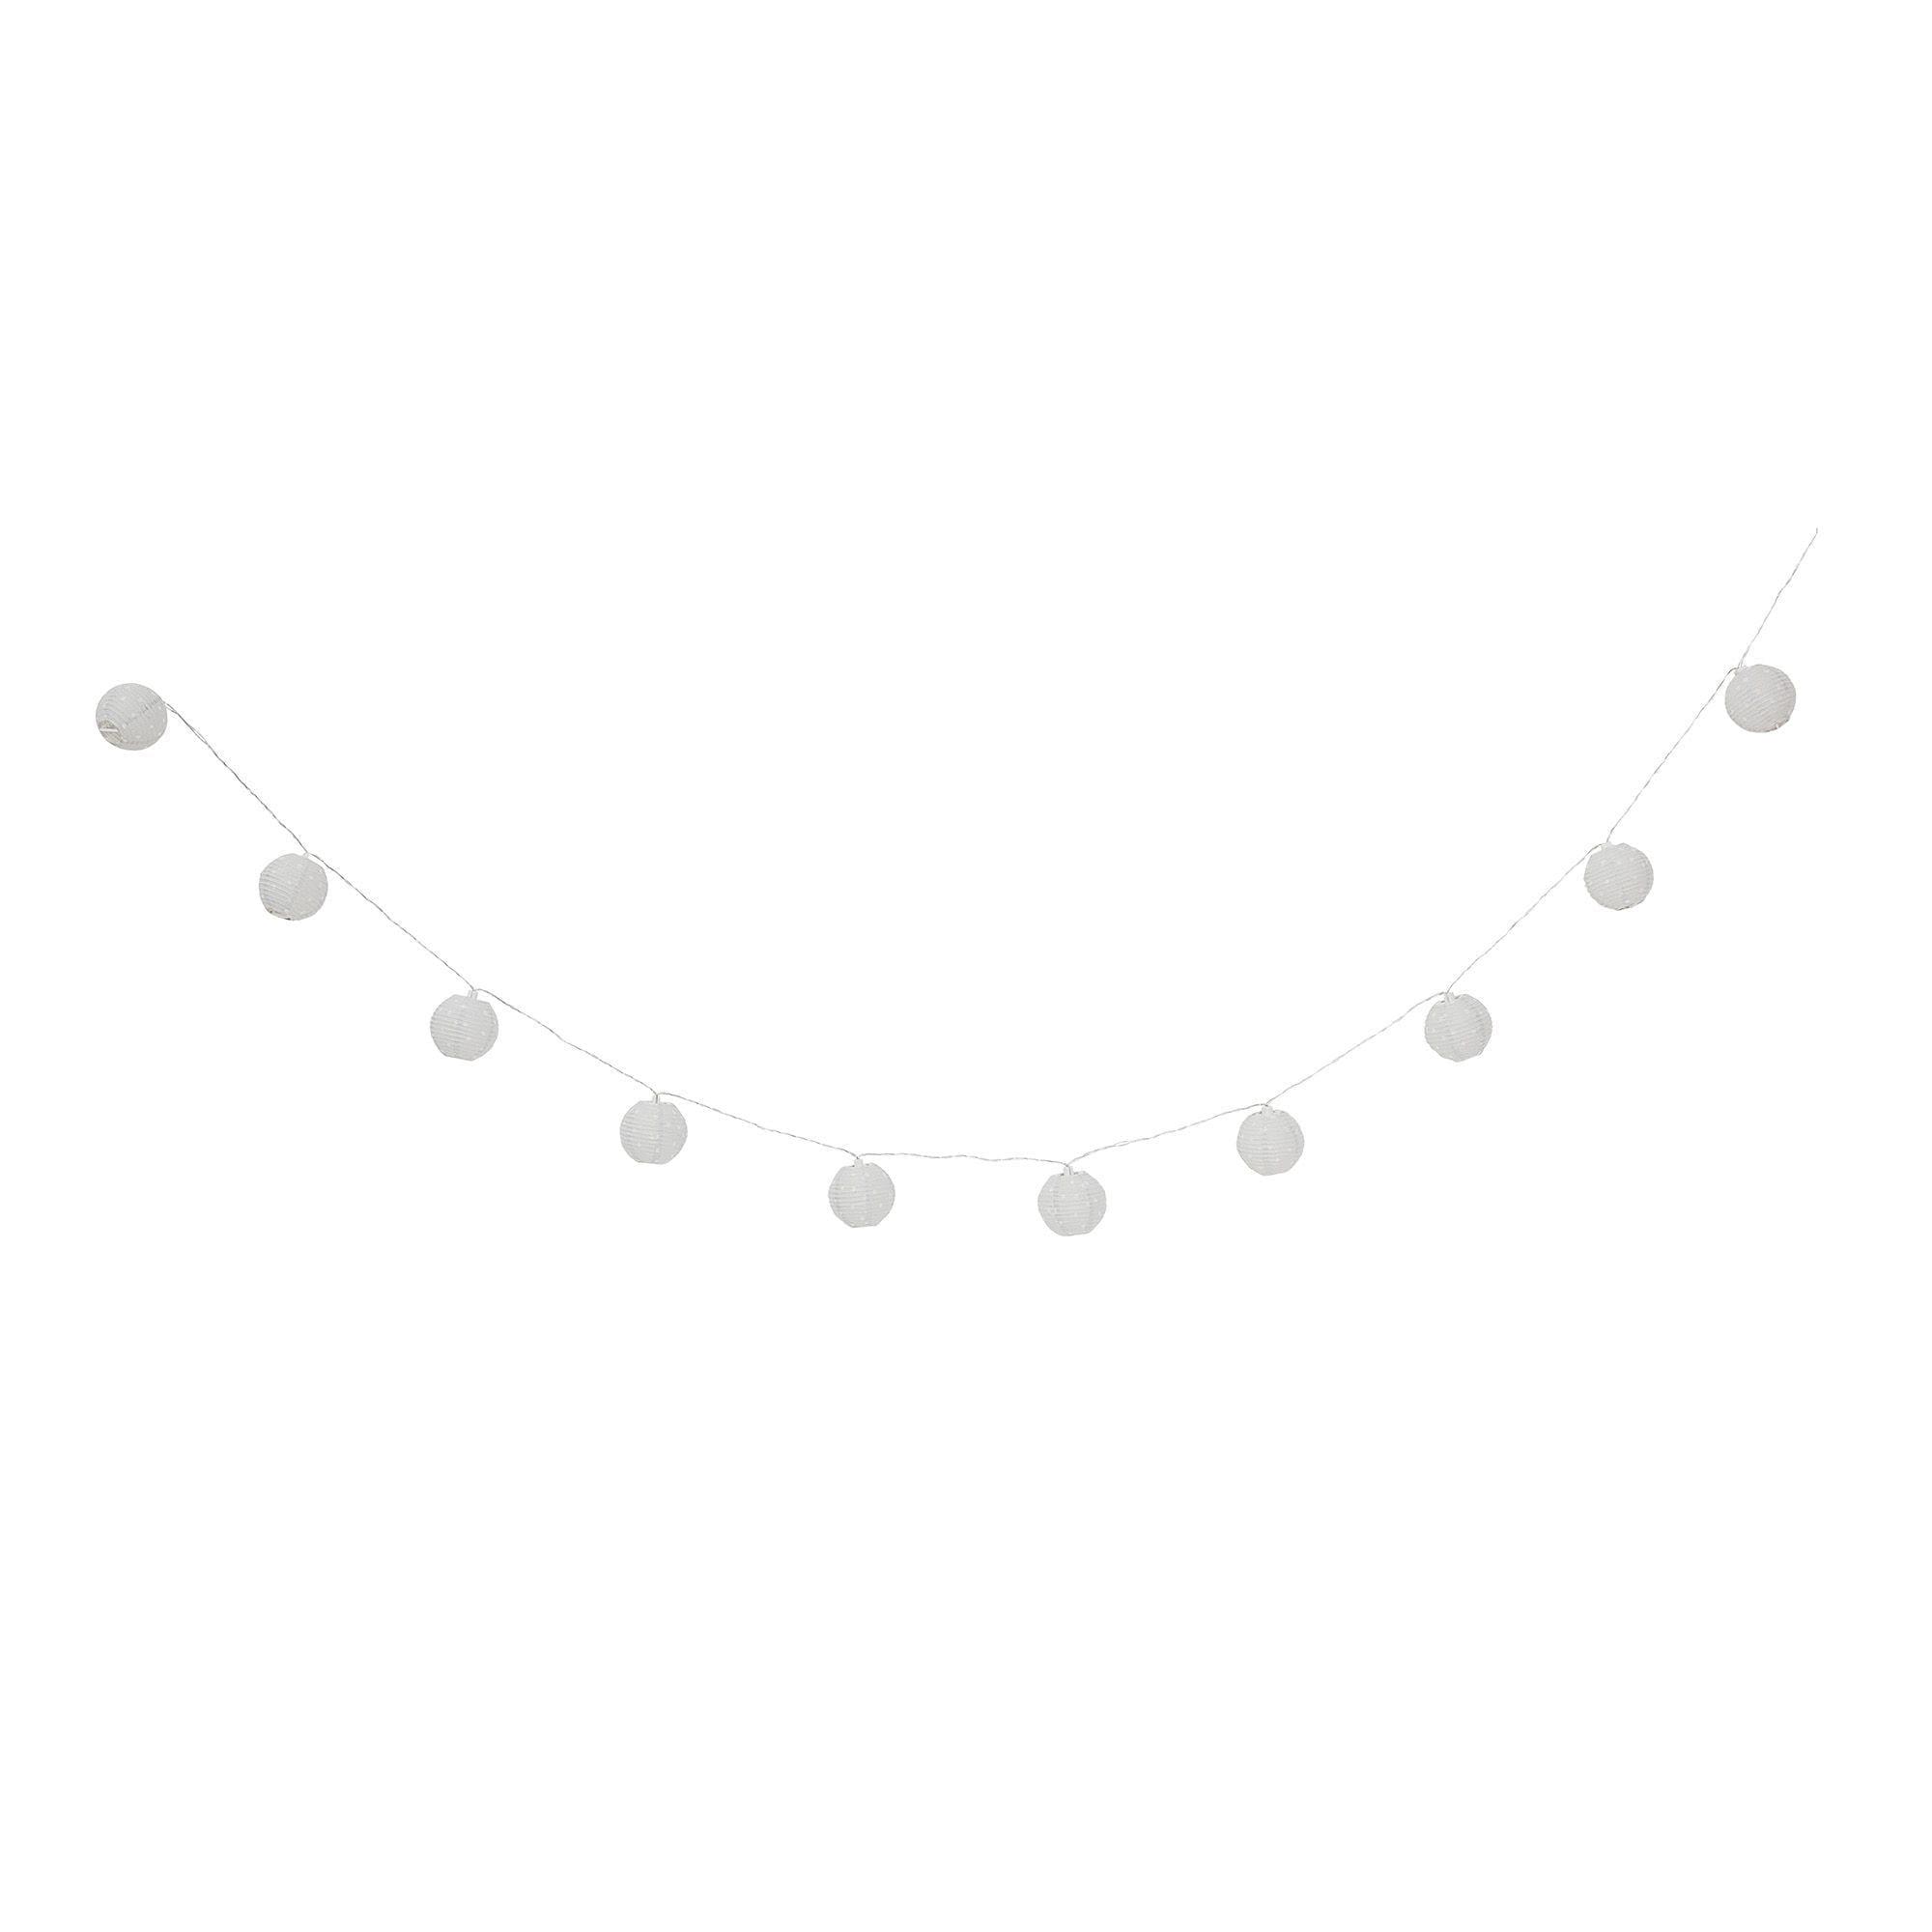 Guirlande lumineuse - Pois gris